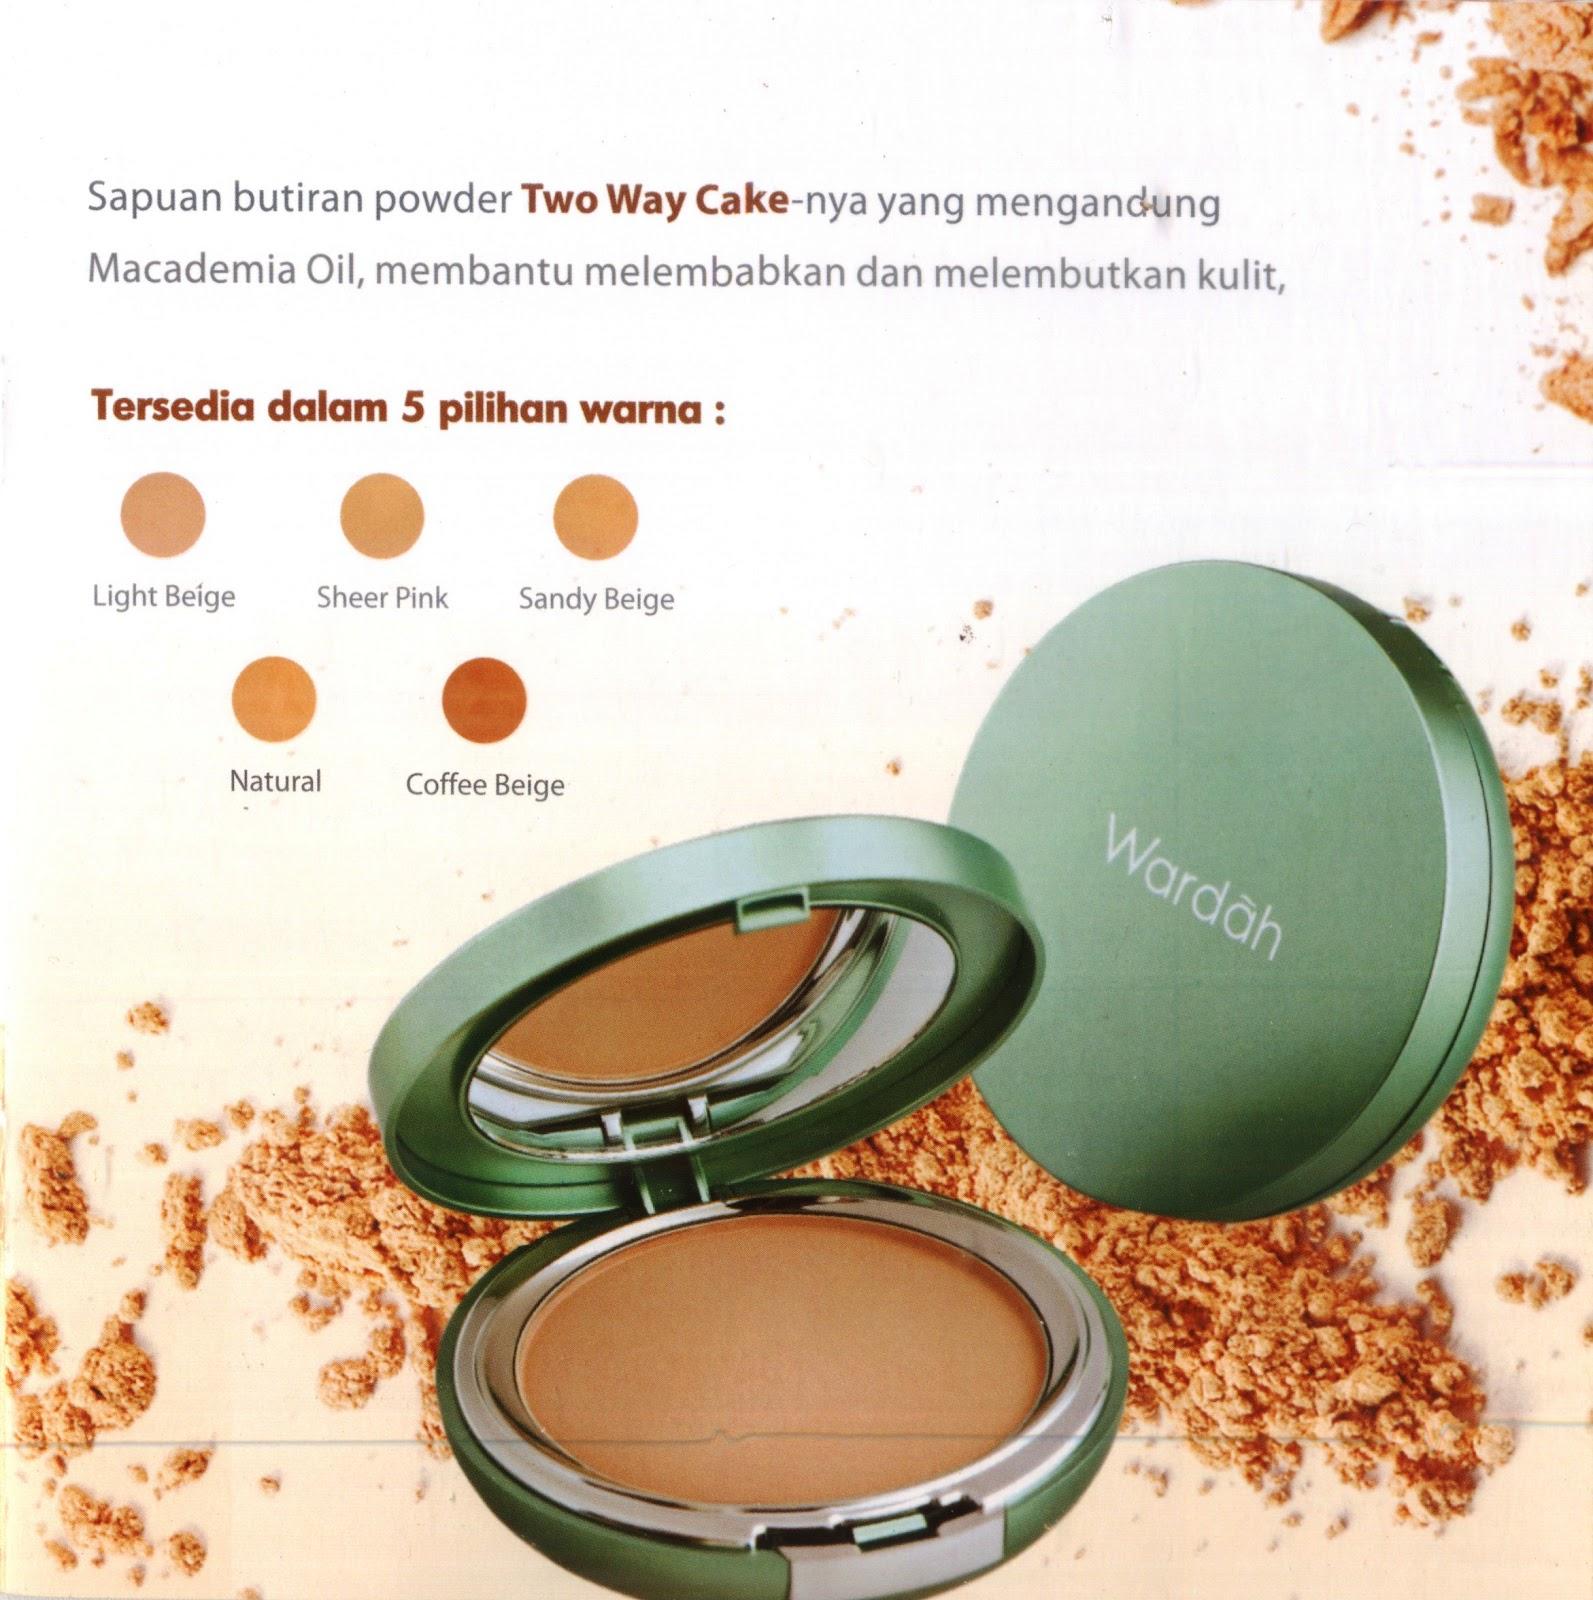 Katalog Wardah 2018 Terbaru 2012 Exclusive Liquid Foundation 05 Coffee Beige Two Way Cake